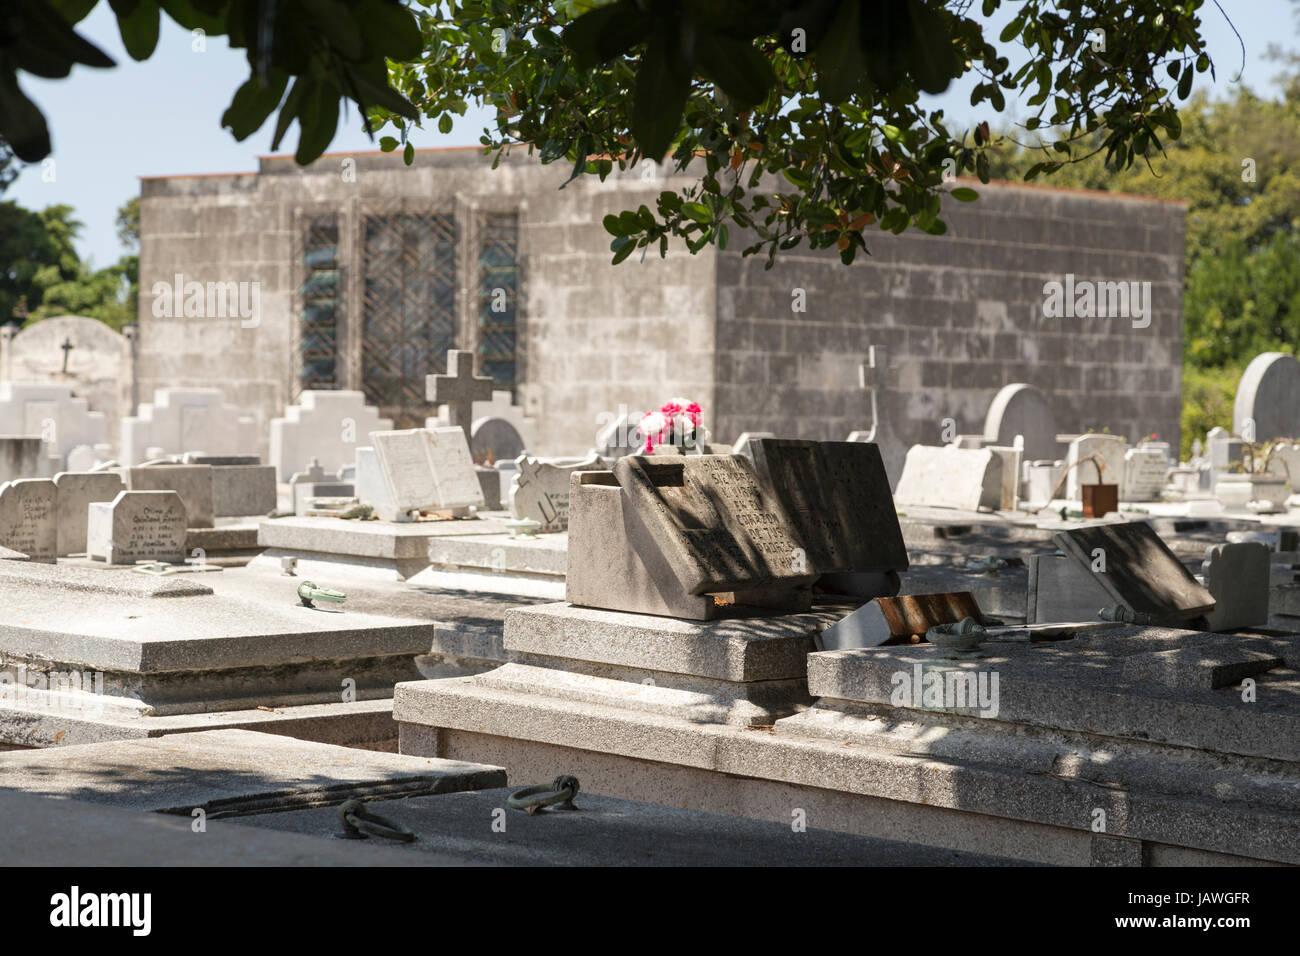 Cemetery Cementerio Cristobal Colon in Havana, Cuba - Stock Image